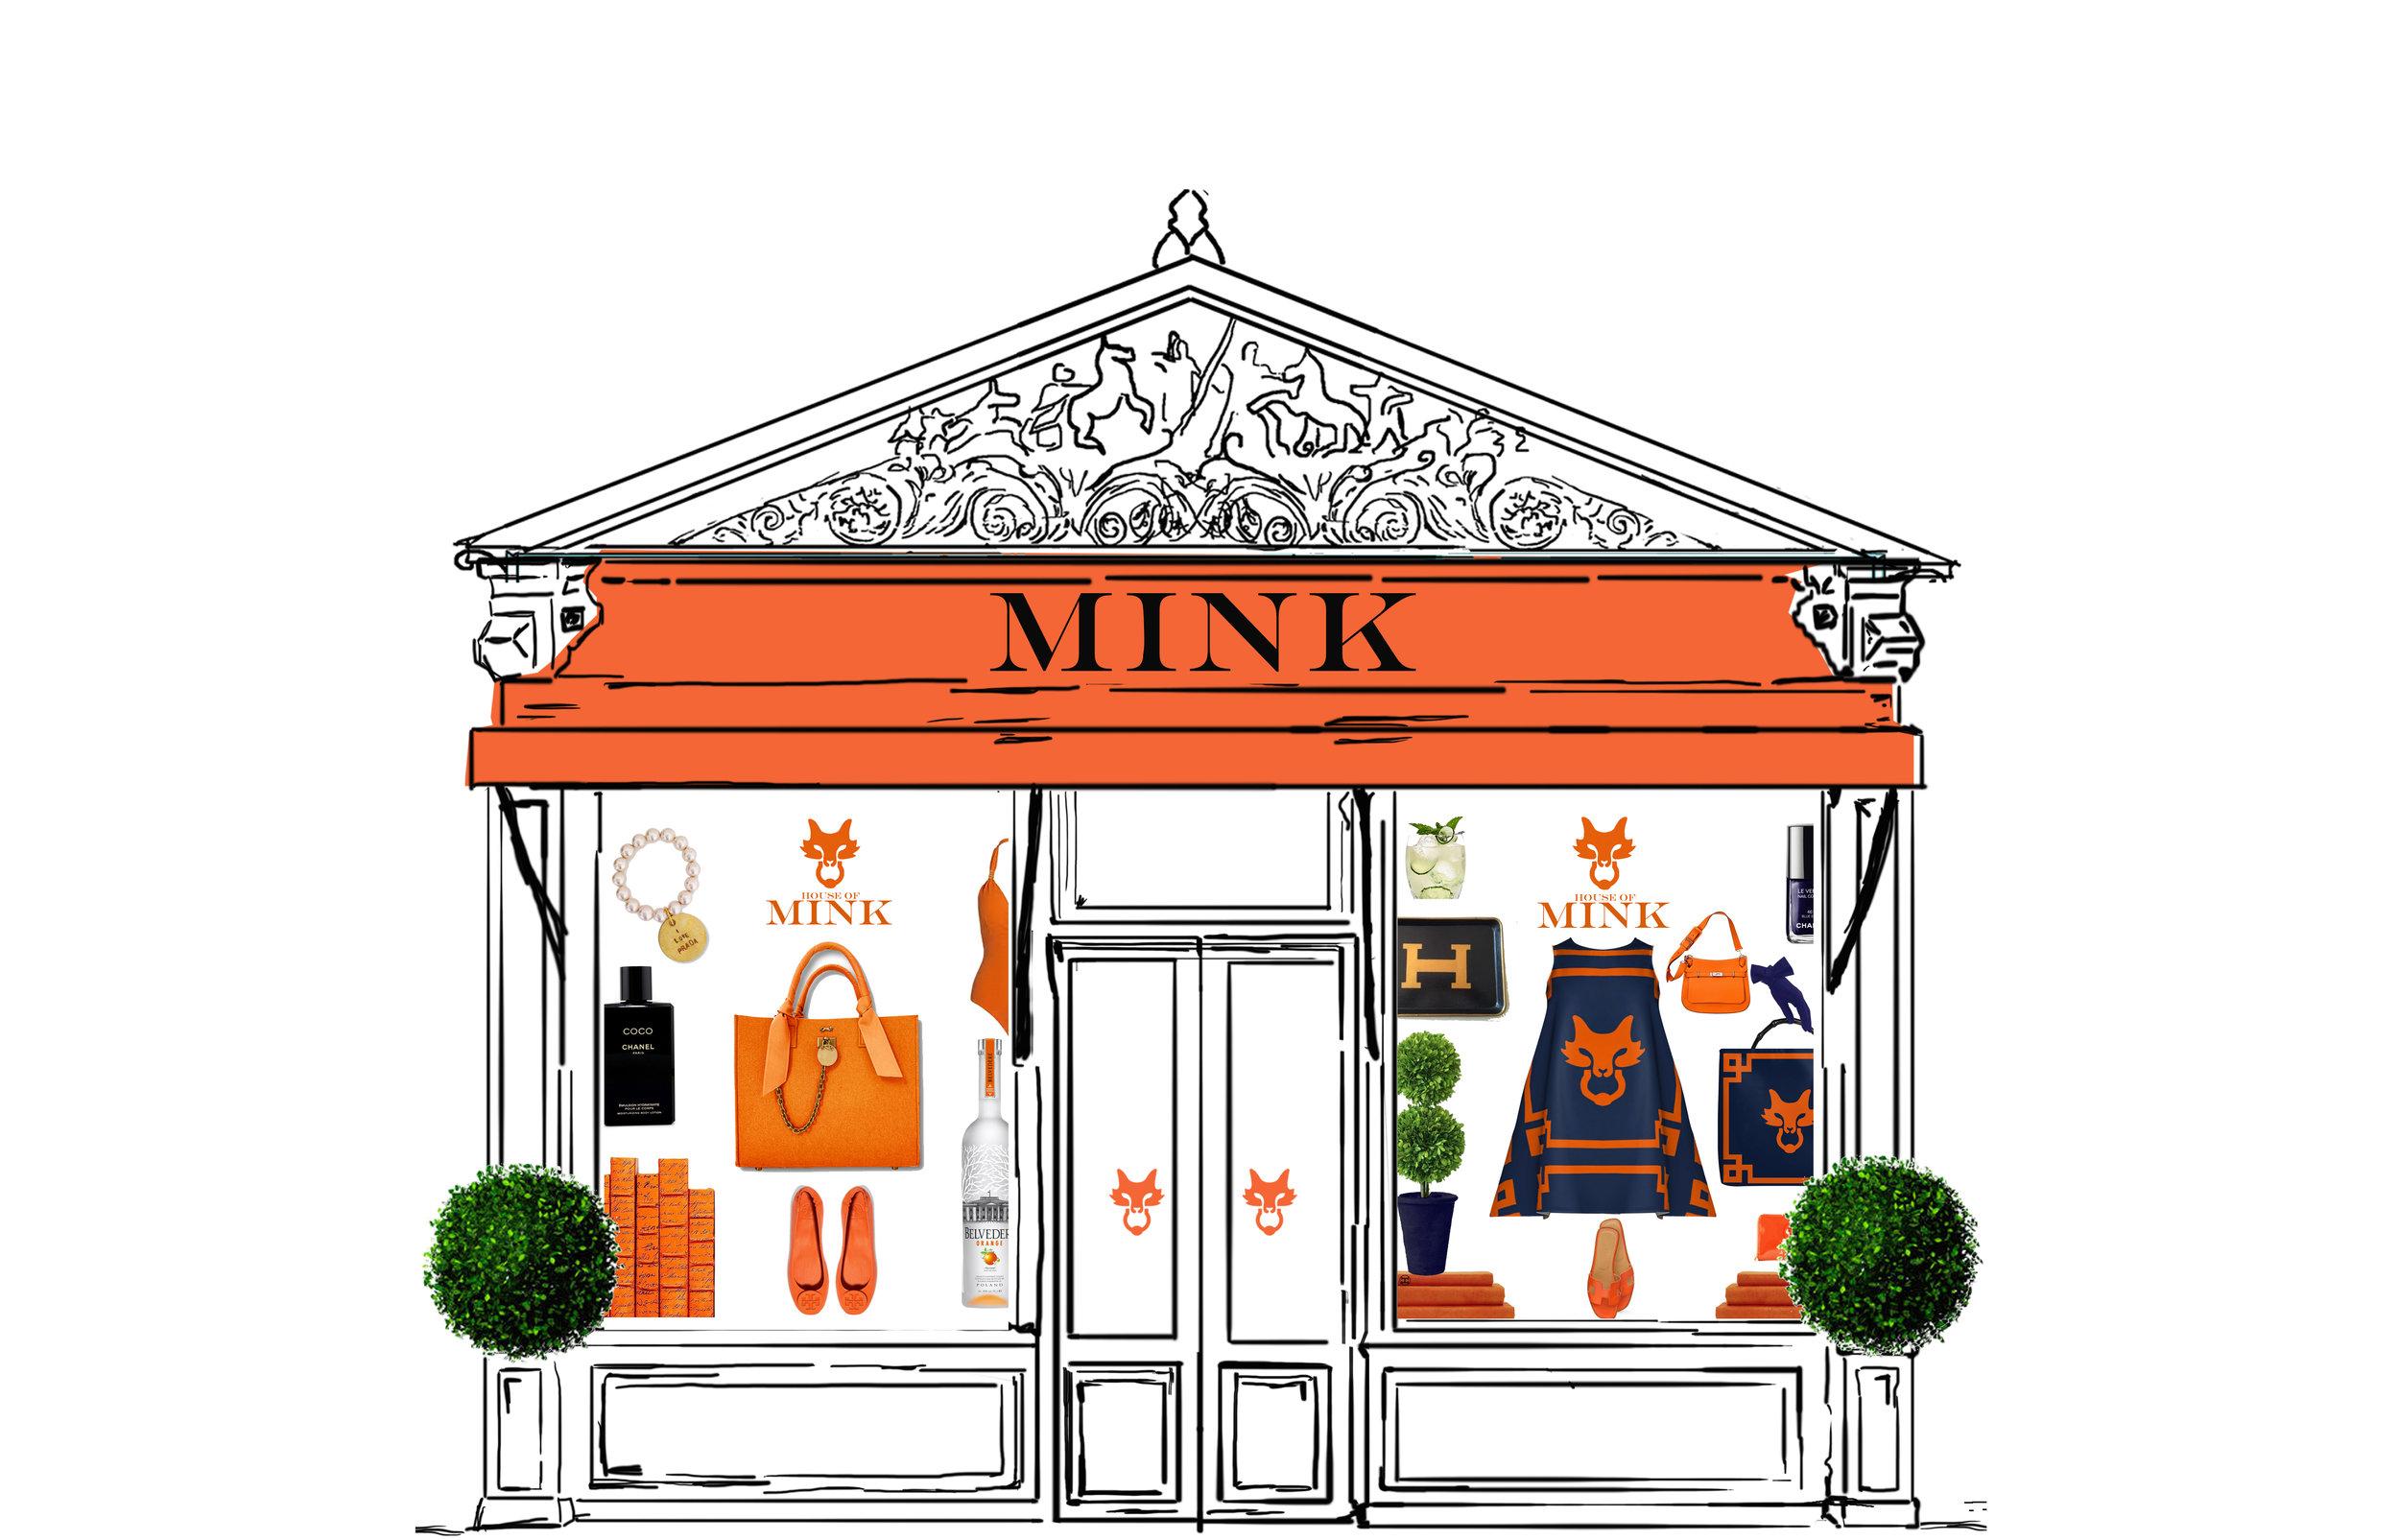 mink_housebuilding12_SHOP2b.jpg